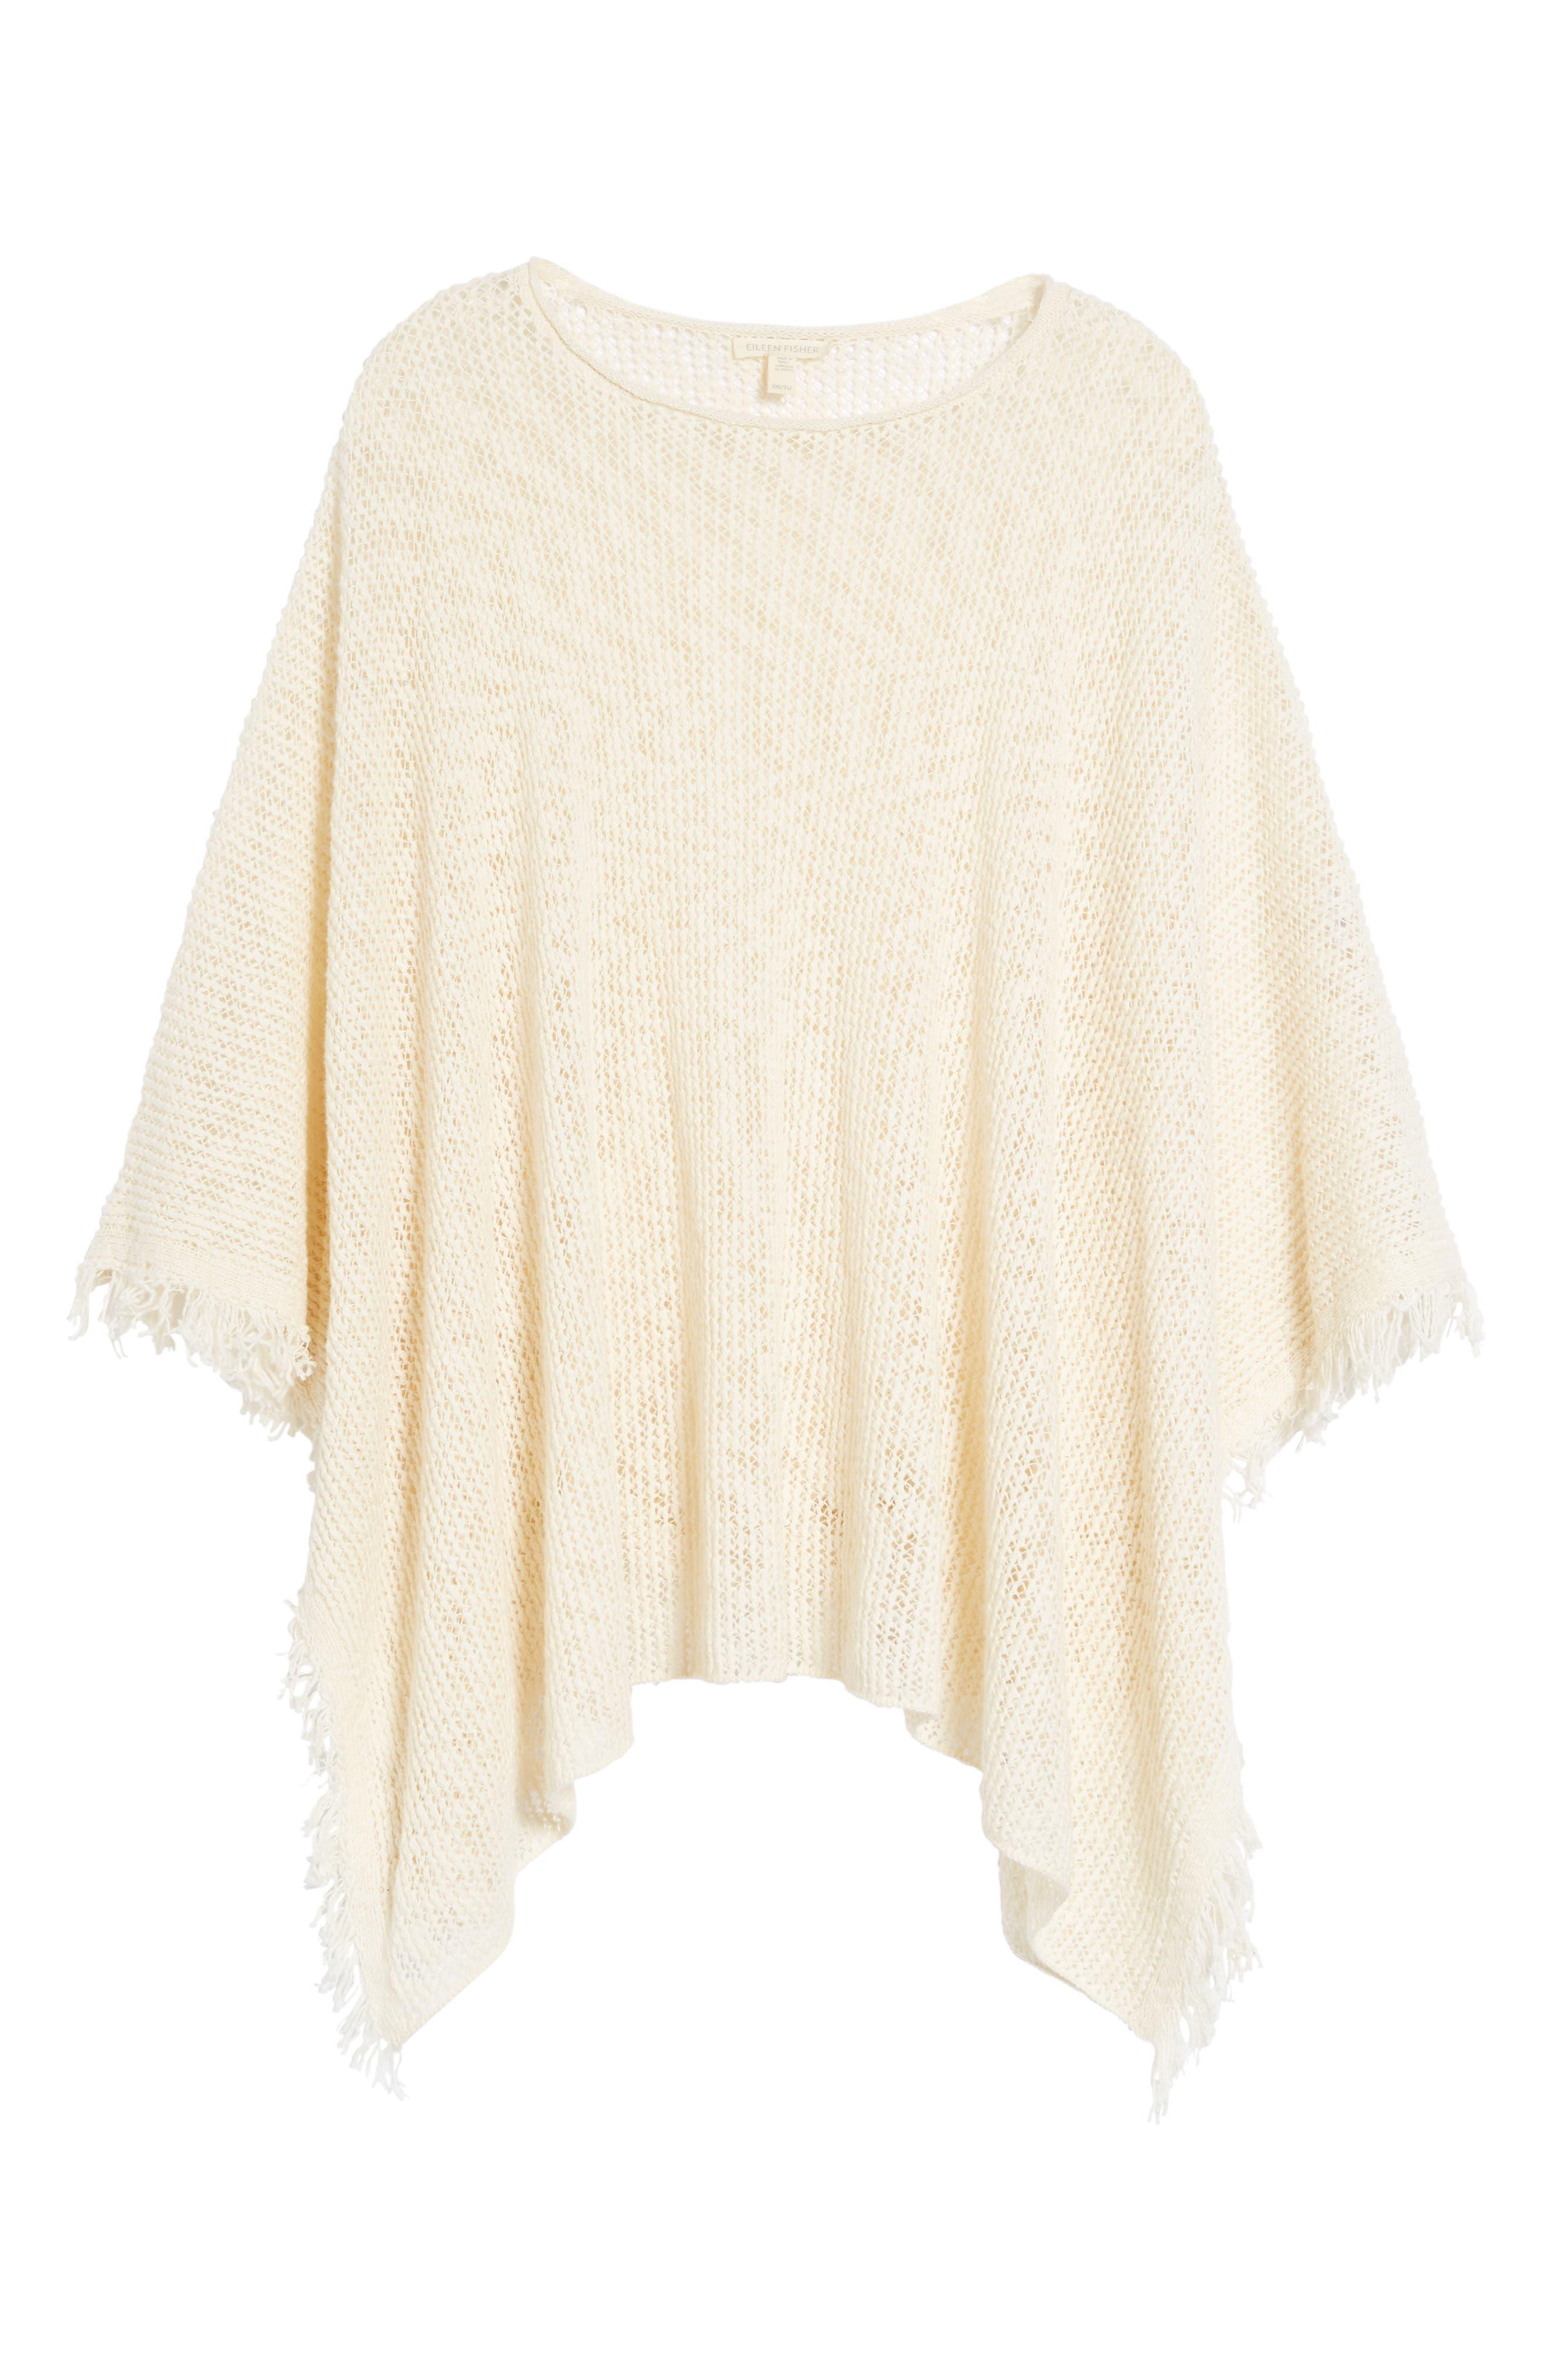 Organic Cotton Poncho,                             Alternate thumbnail 6, color,                             103